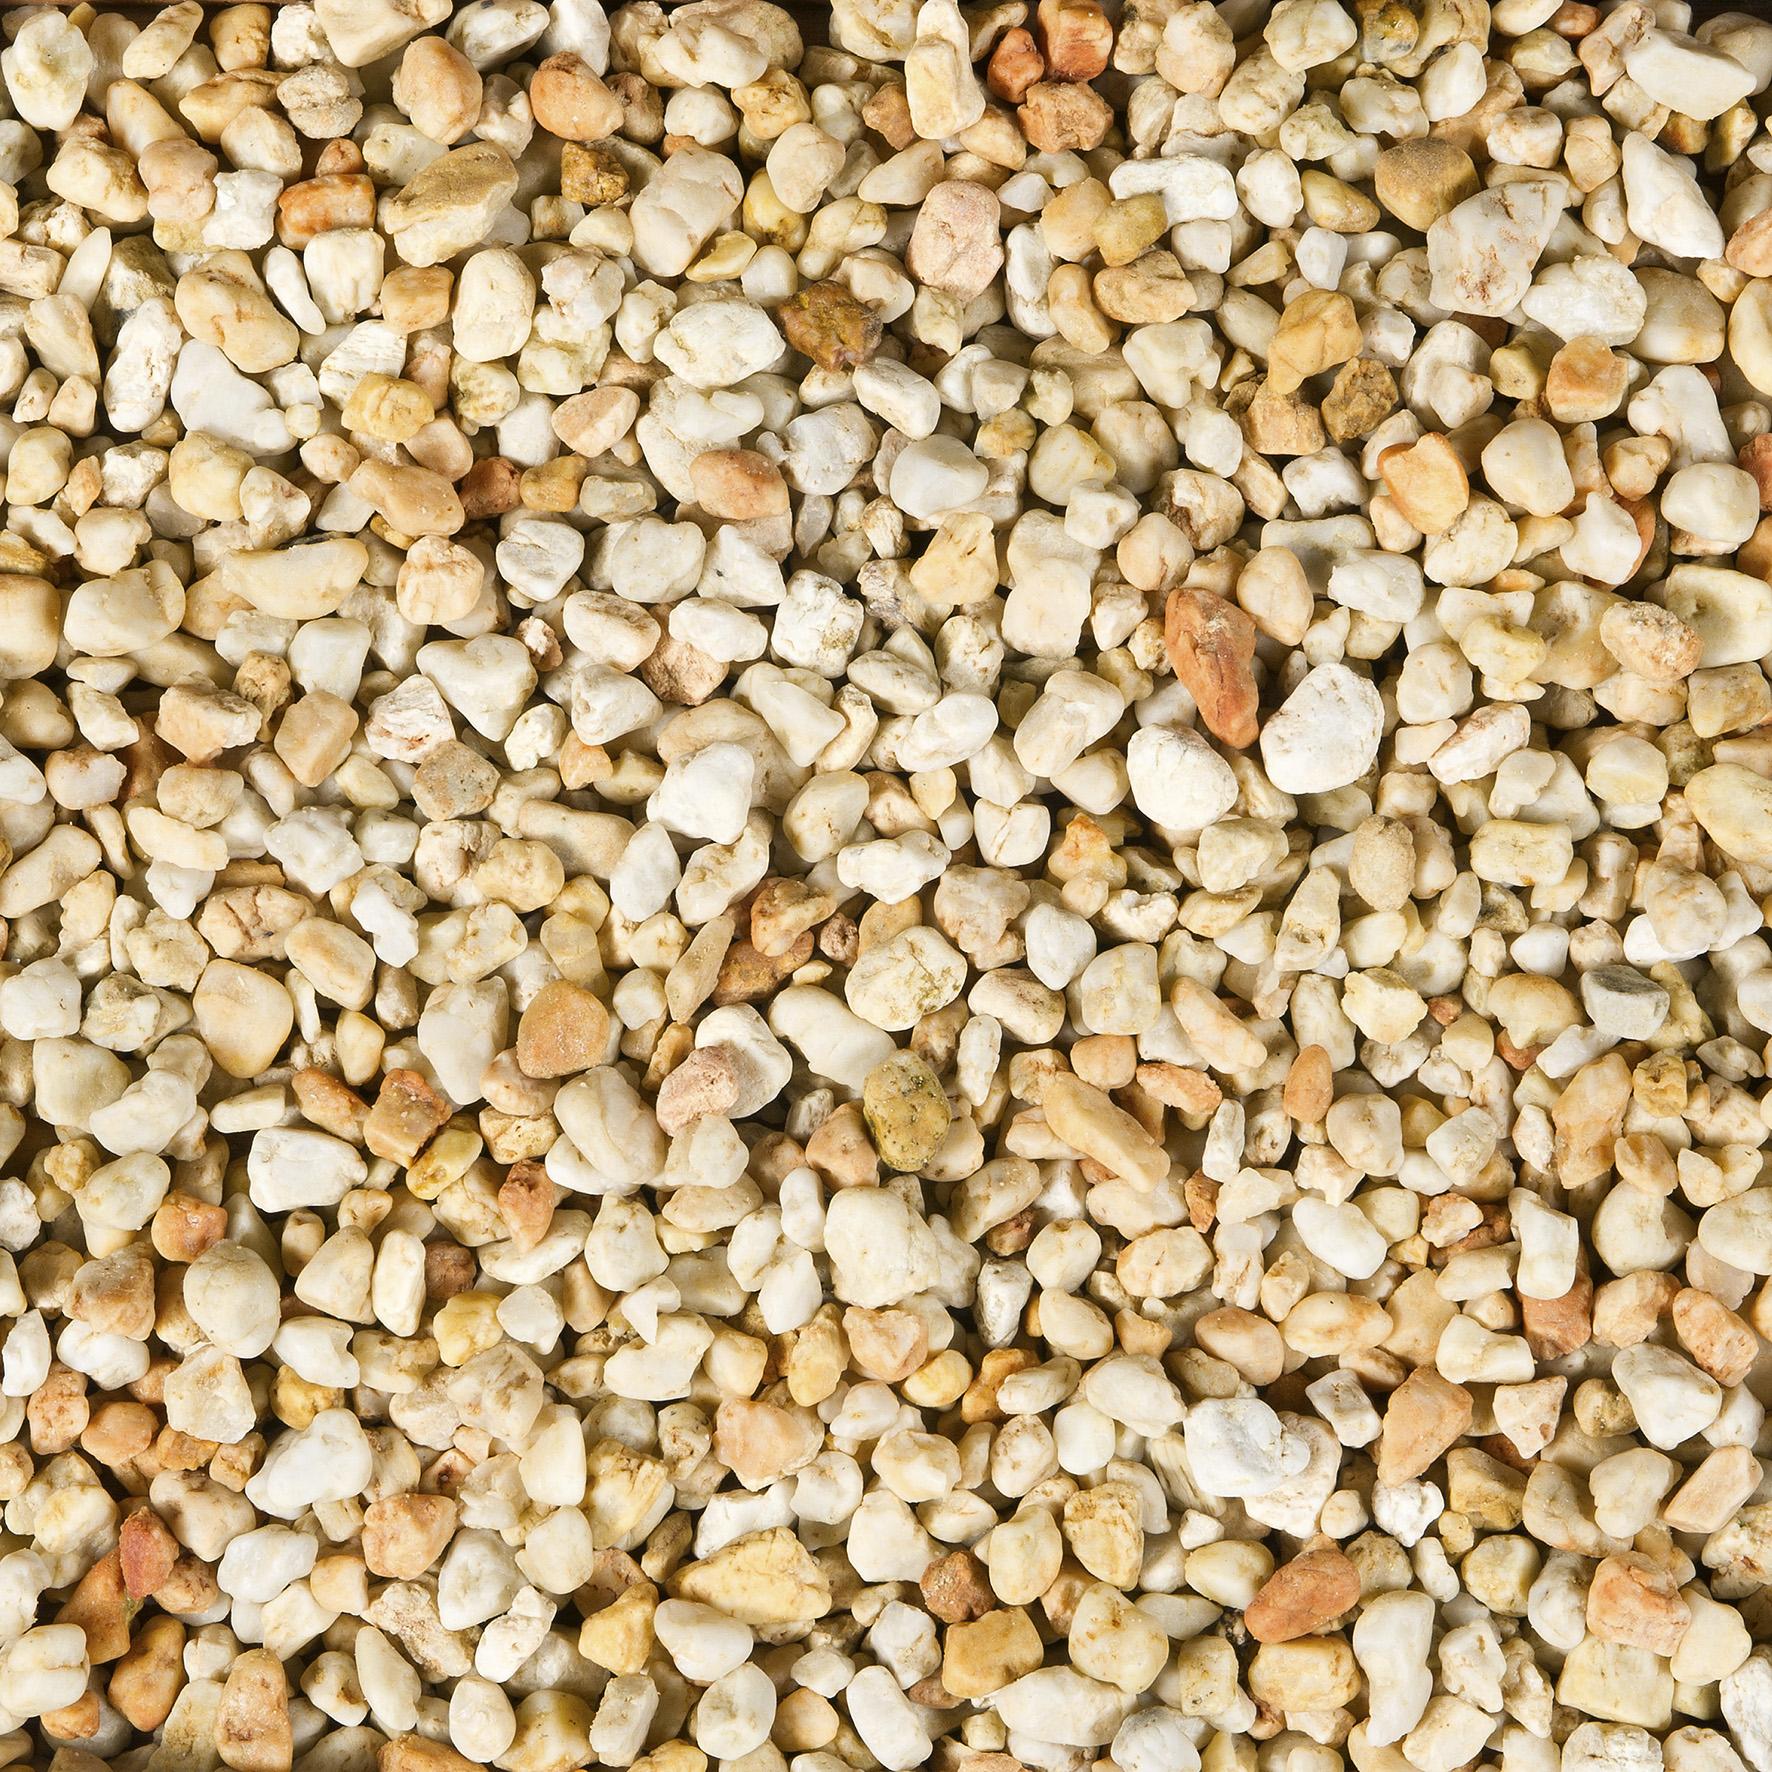 Gardenlux | Taunus Kwarts 8-16 mm | Bigbag 1 m3